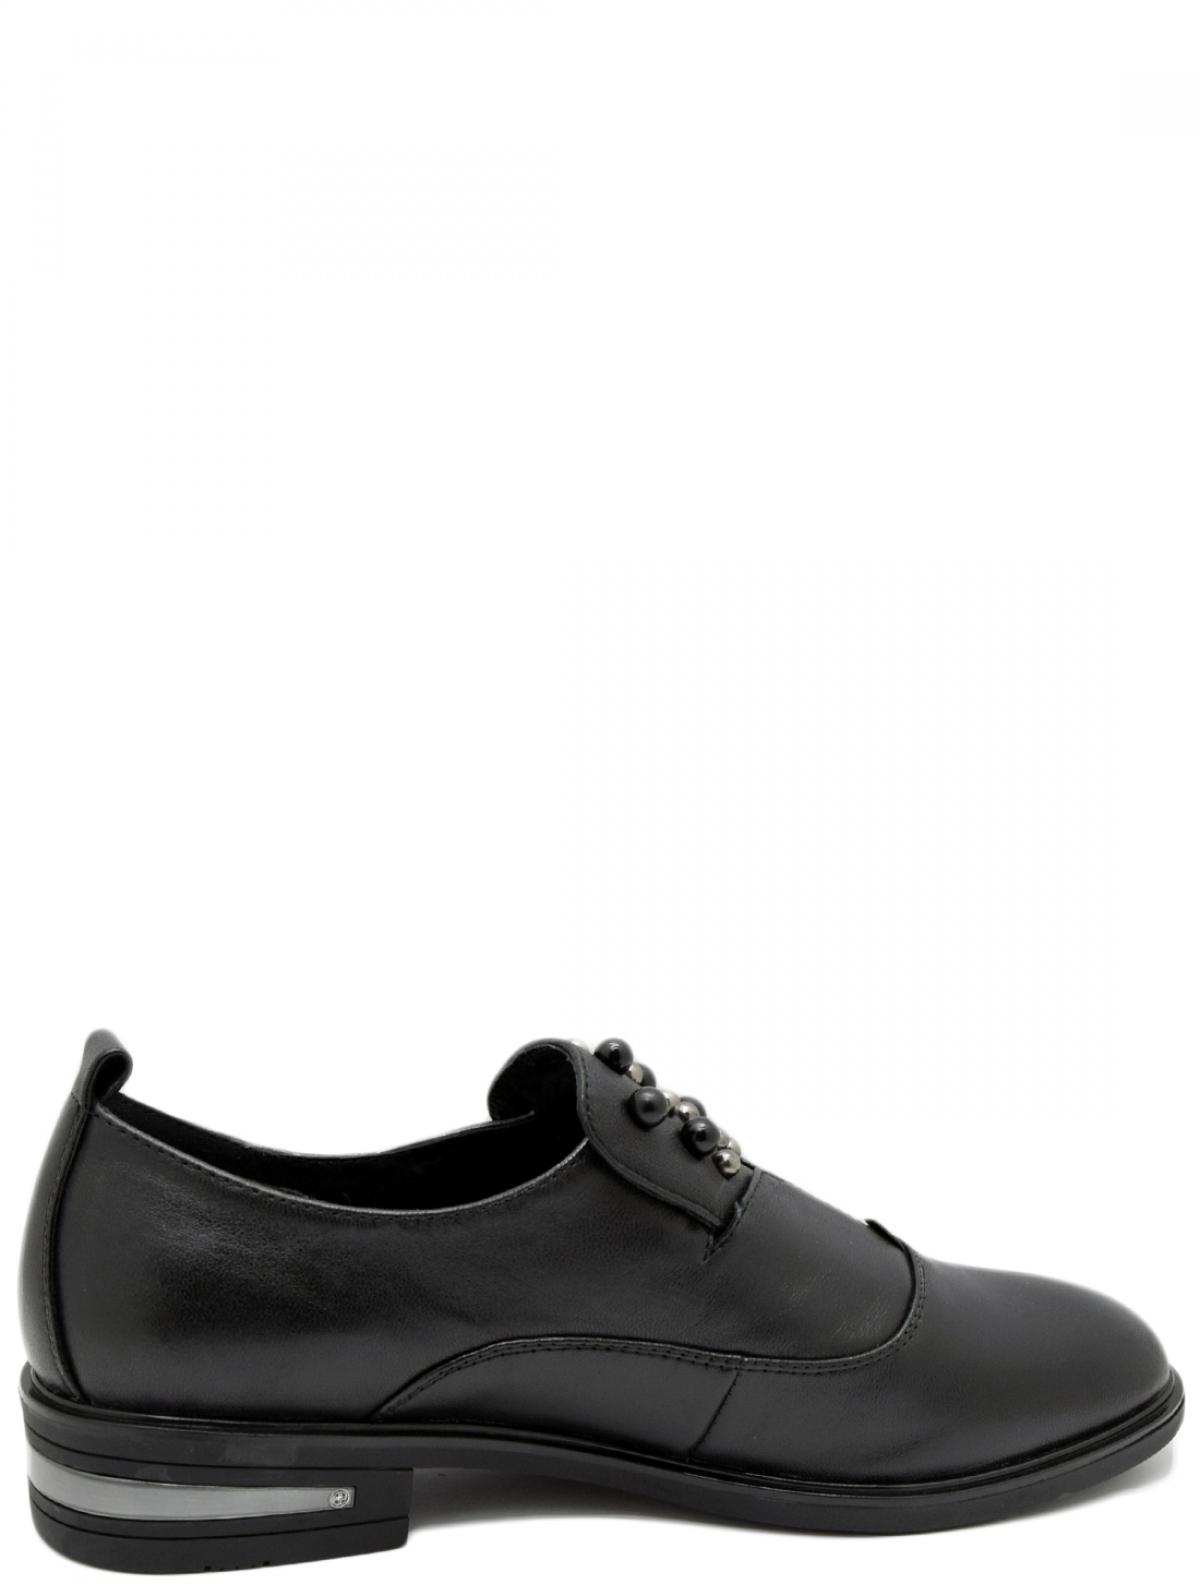 Respect VS74-121999 женские туфли